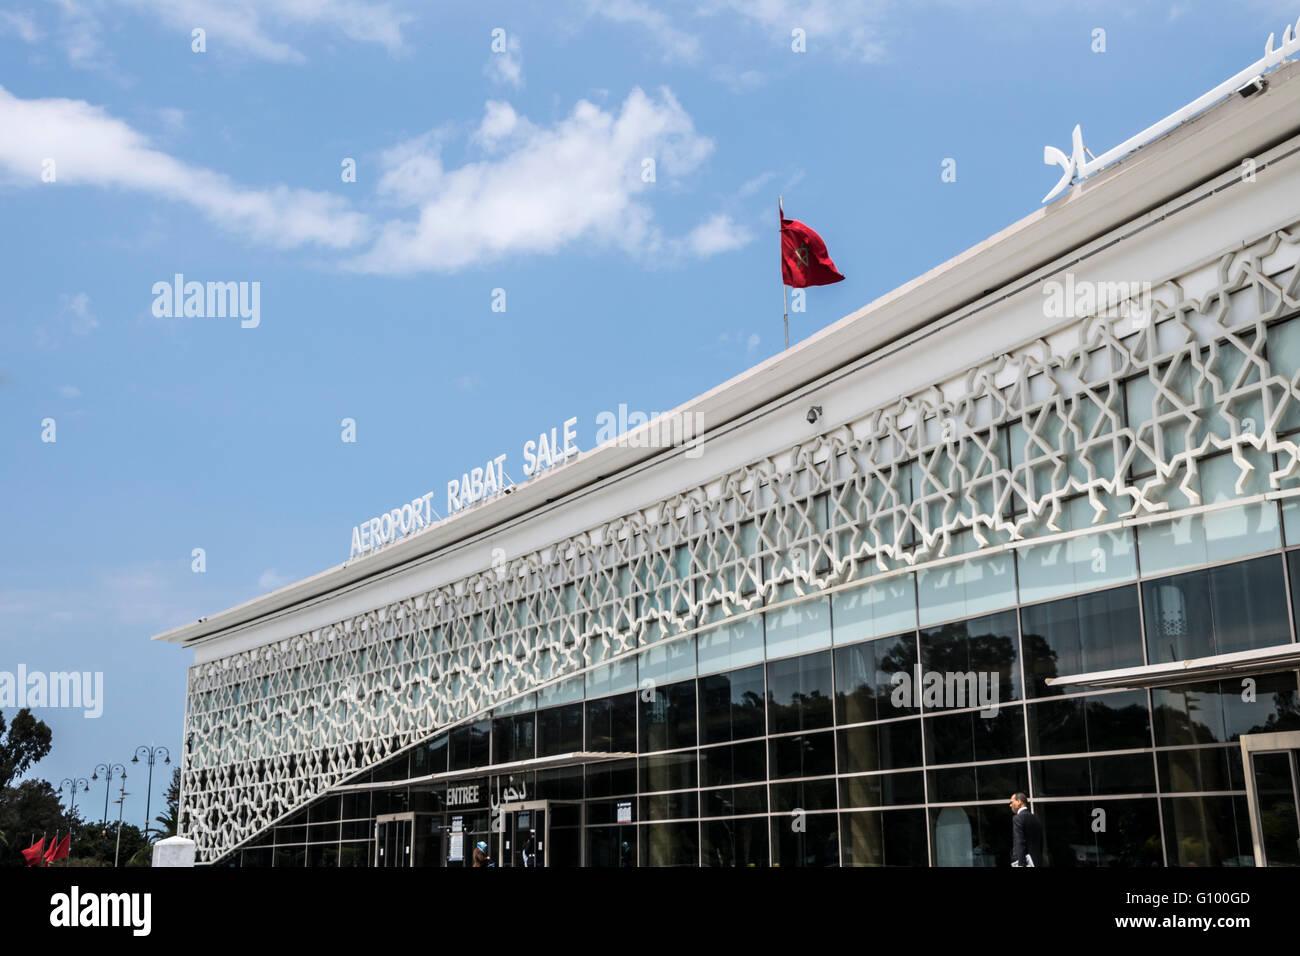 Rabat Sale Airport, Morocco Stock Photo